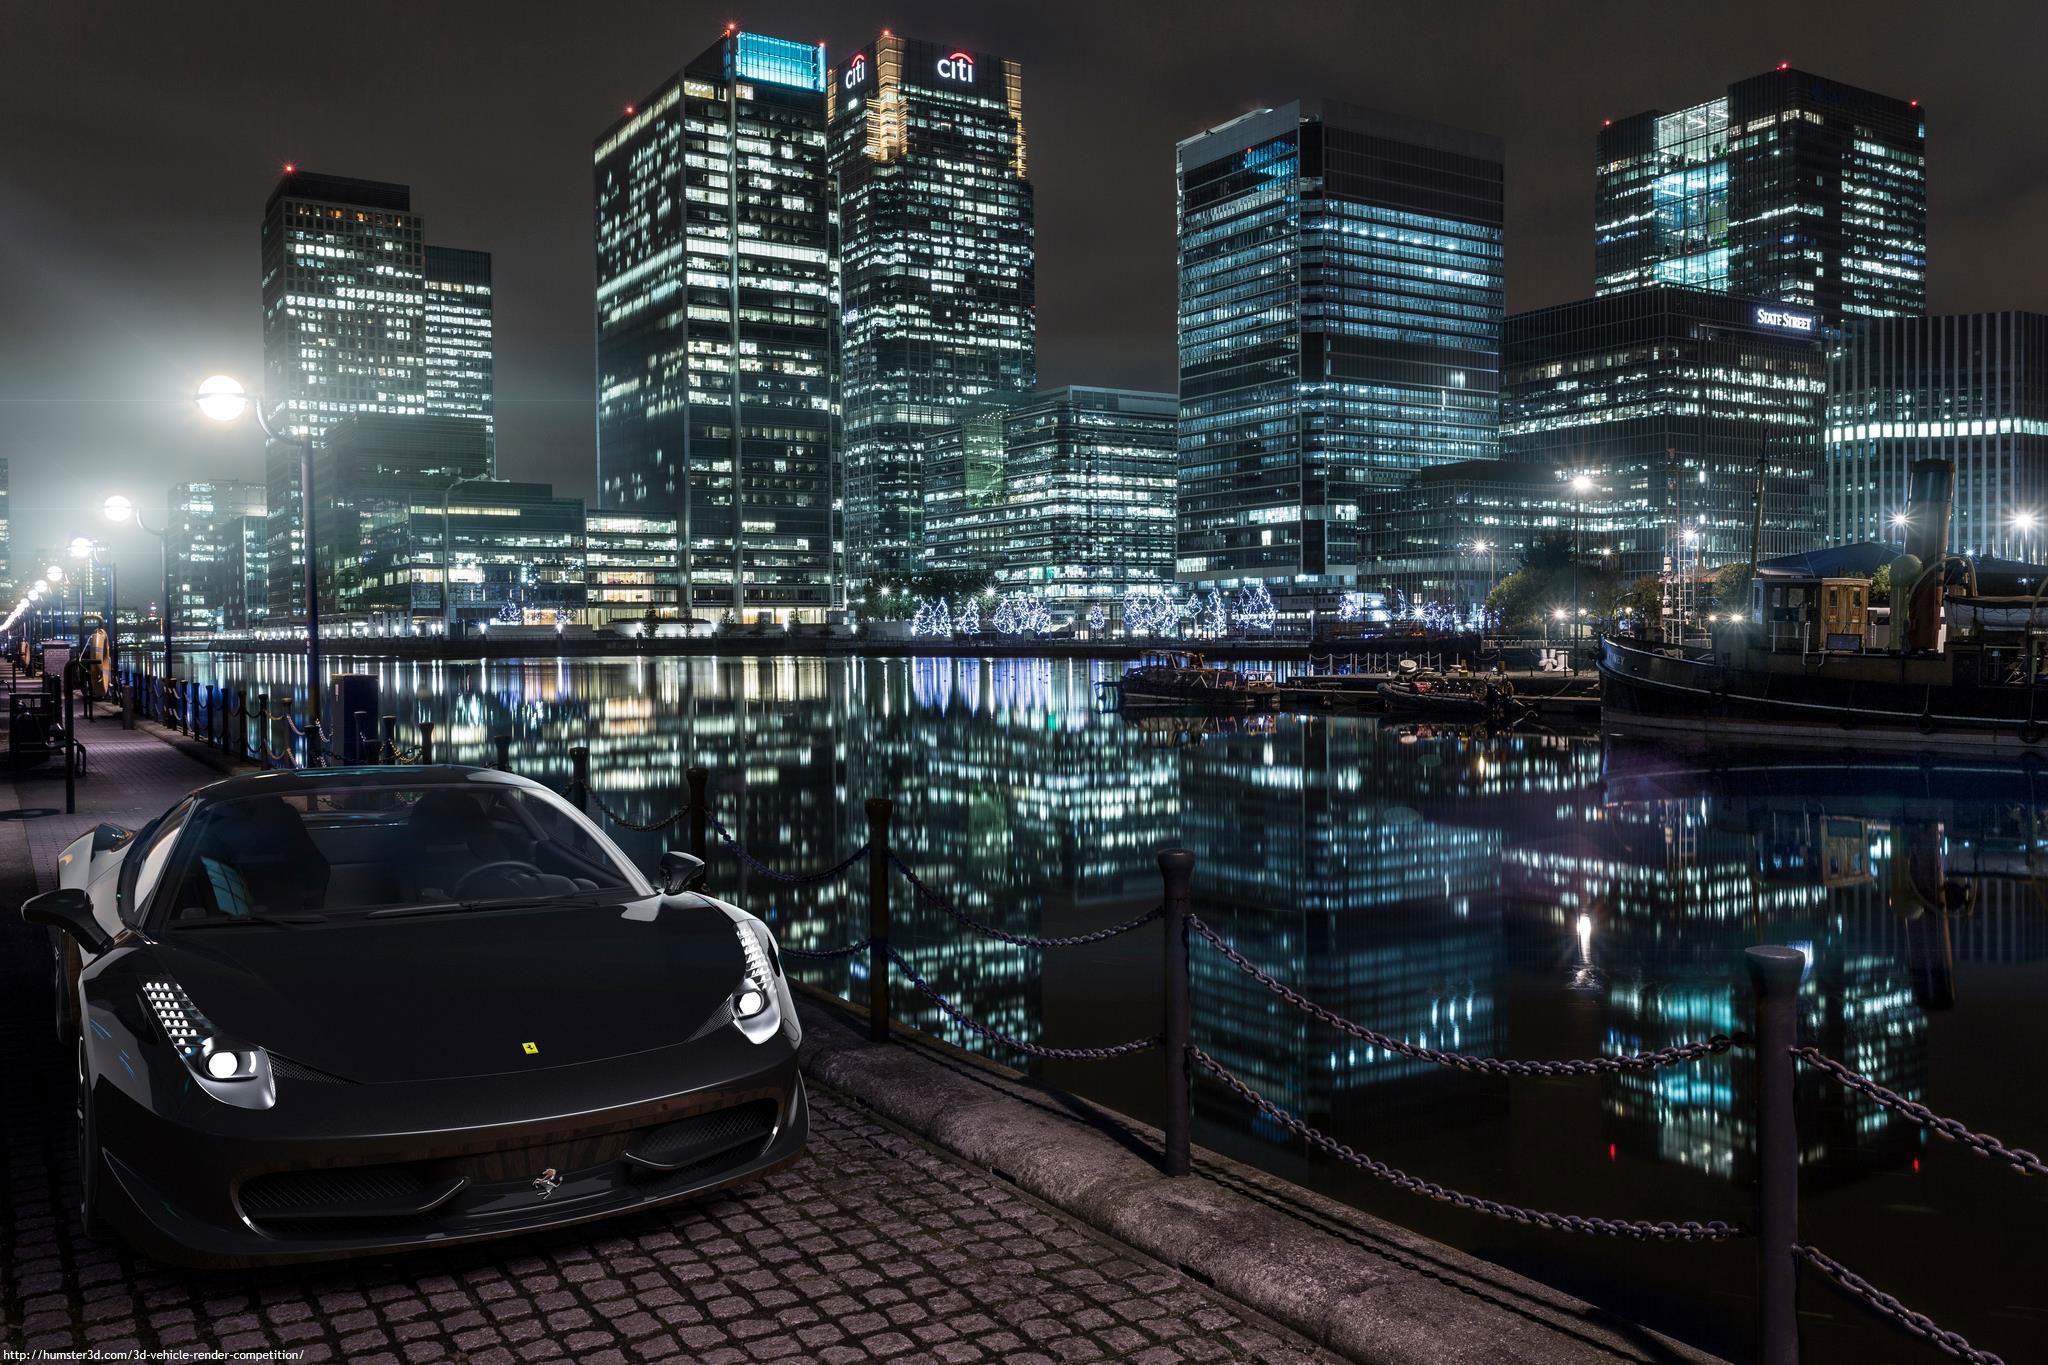 Ferrari Canary Wharf